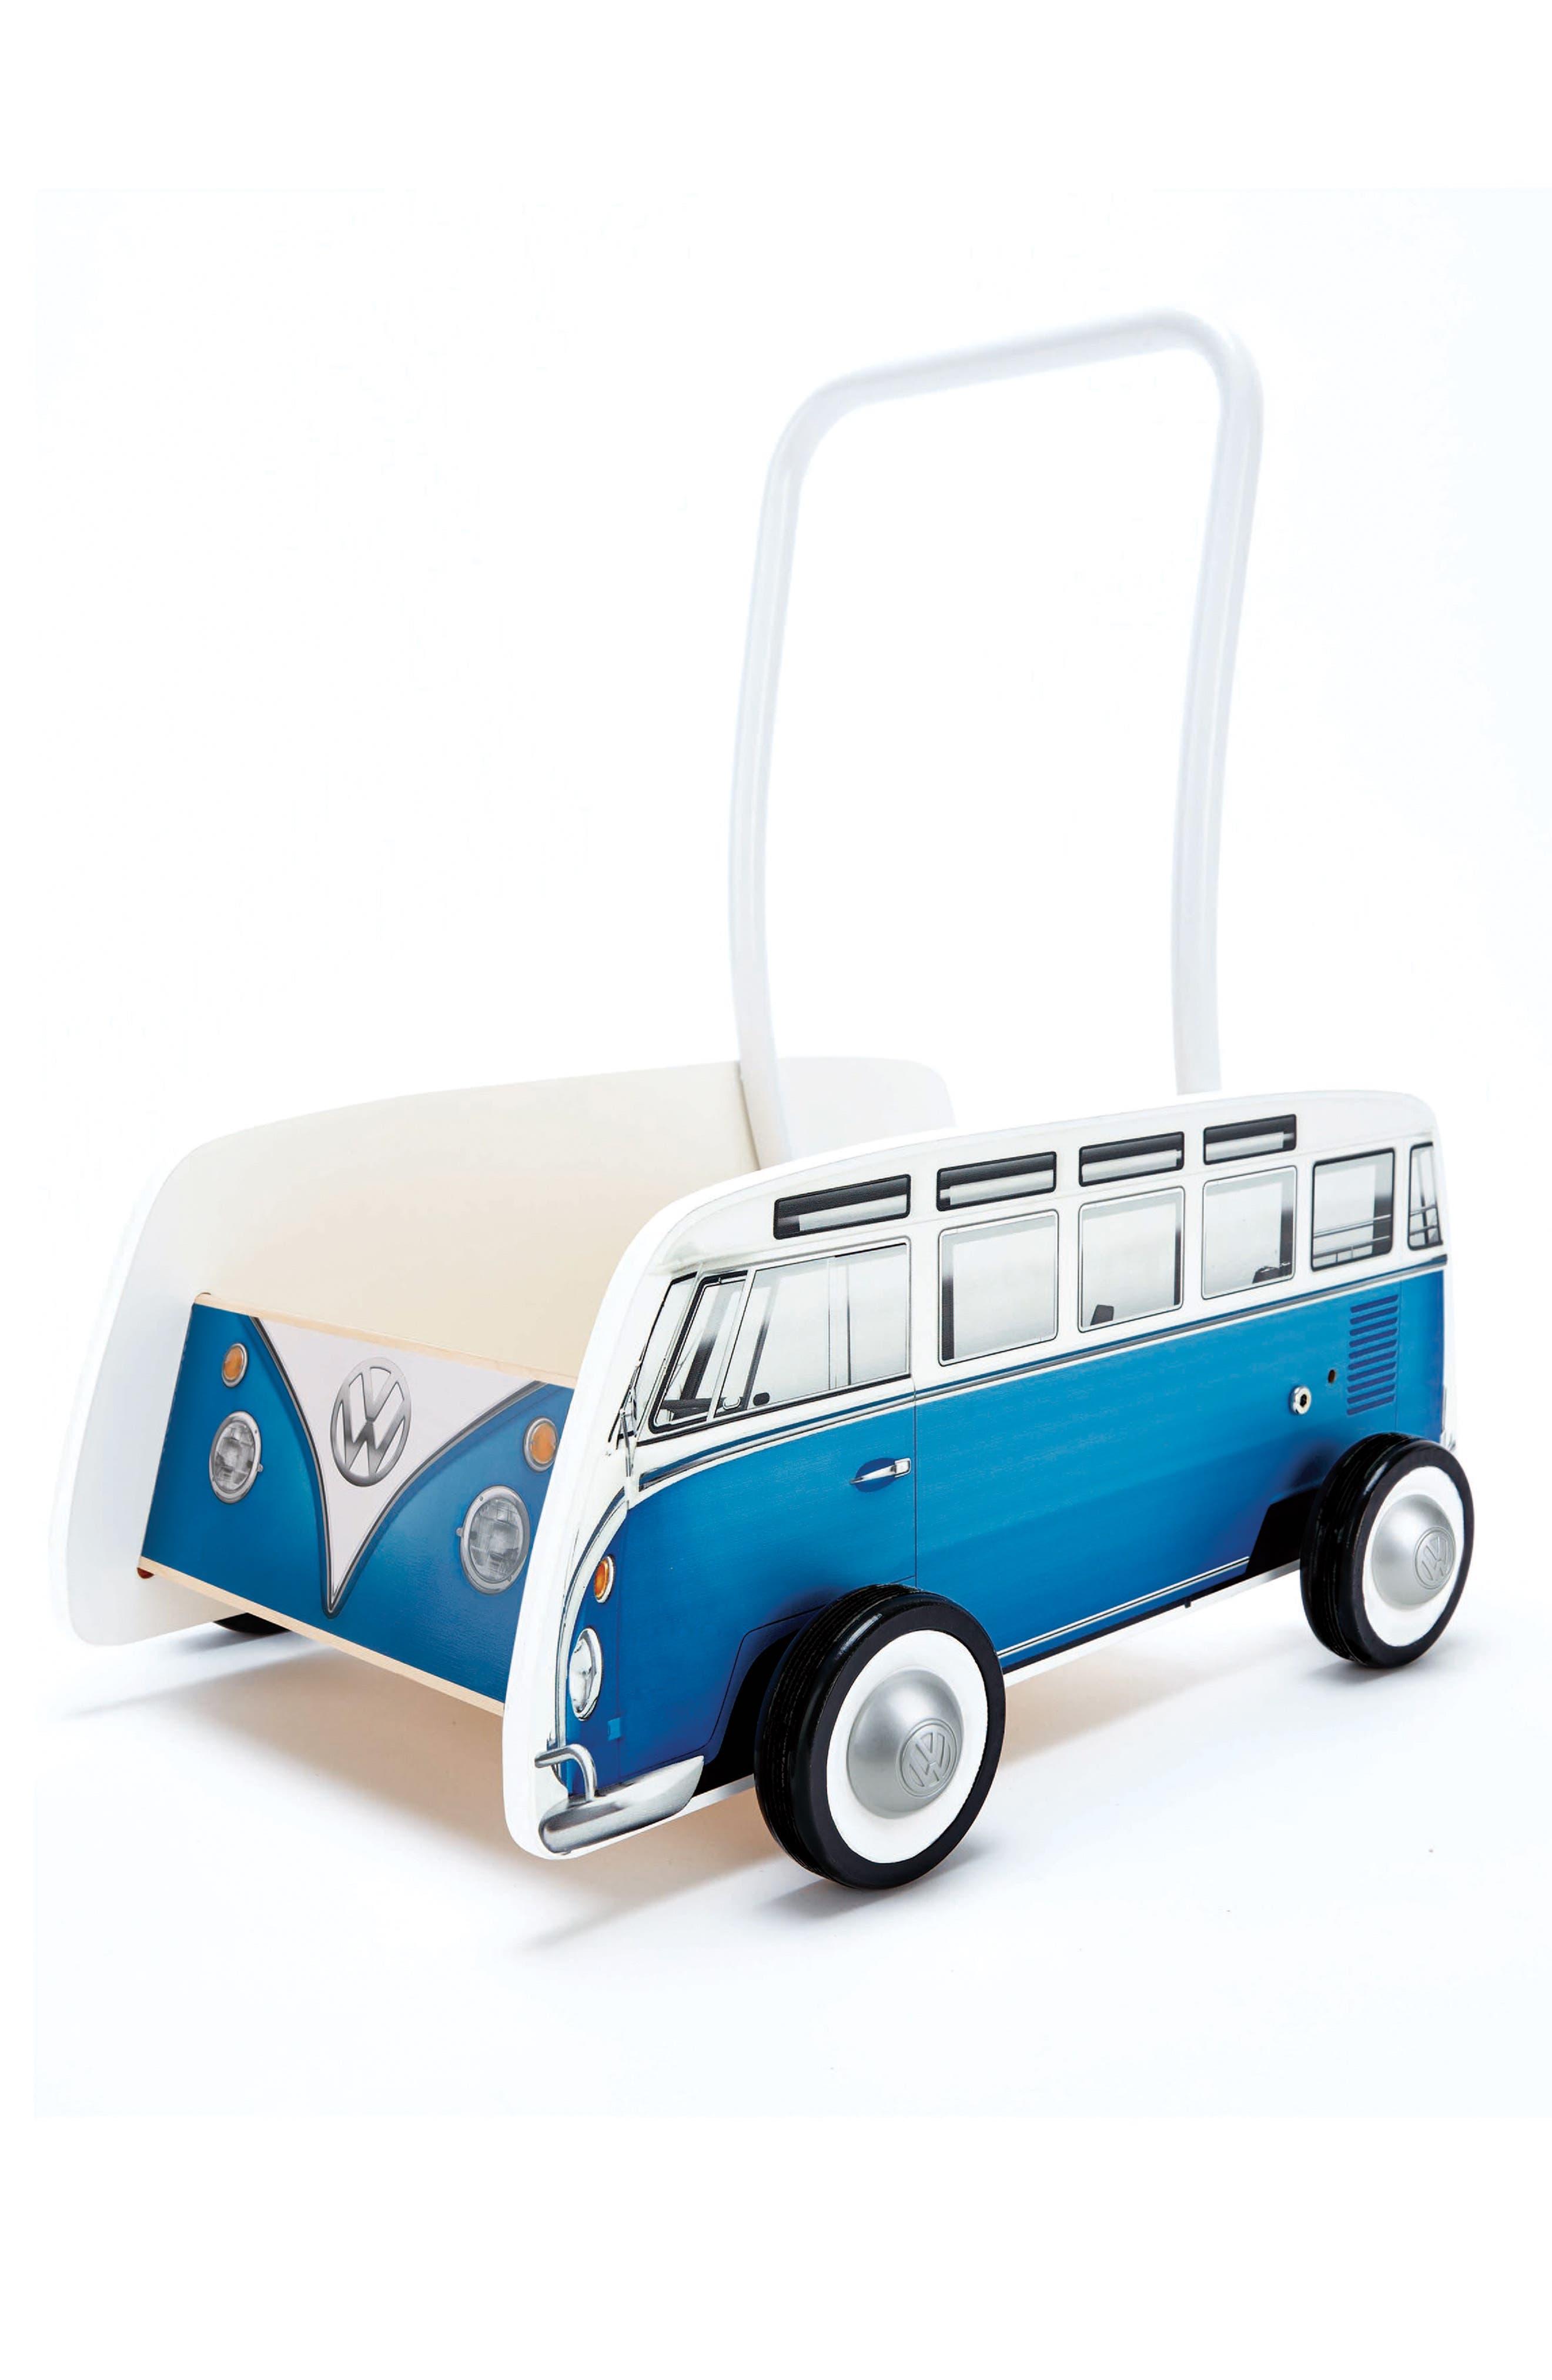 Classical VW Push Bus,                             Main thumbnail 1, color,                             Blue